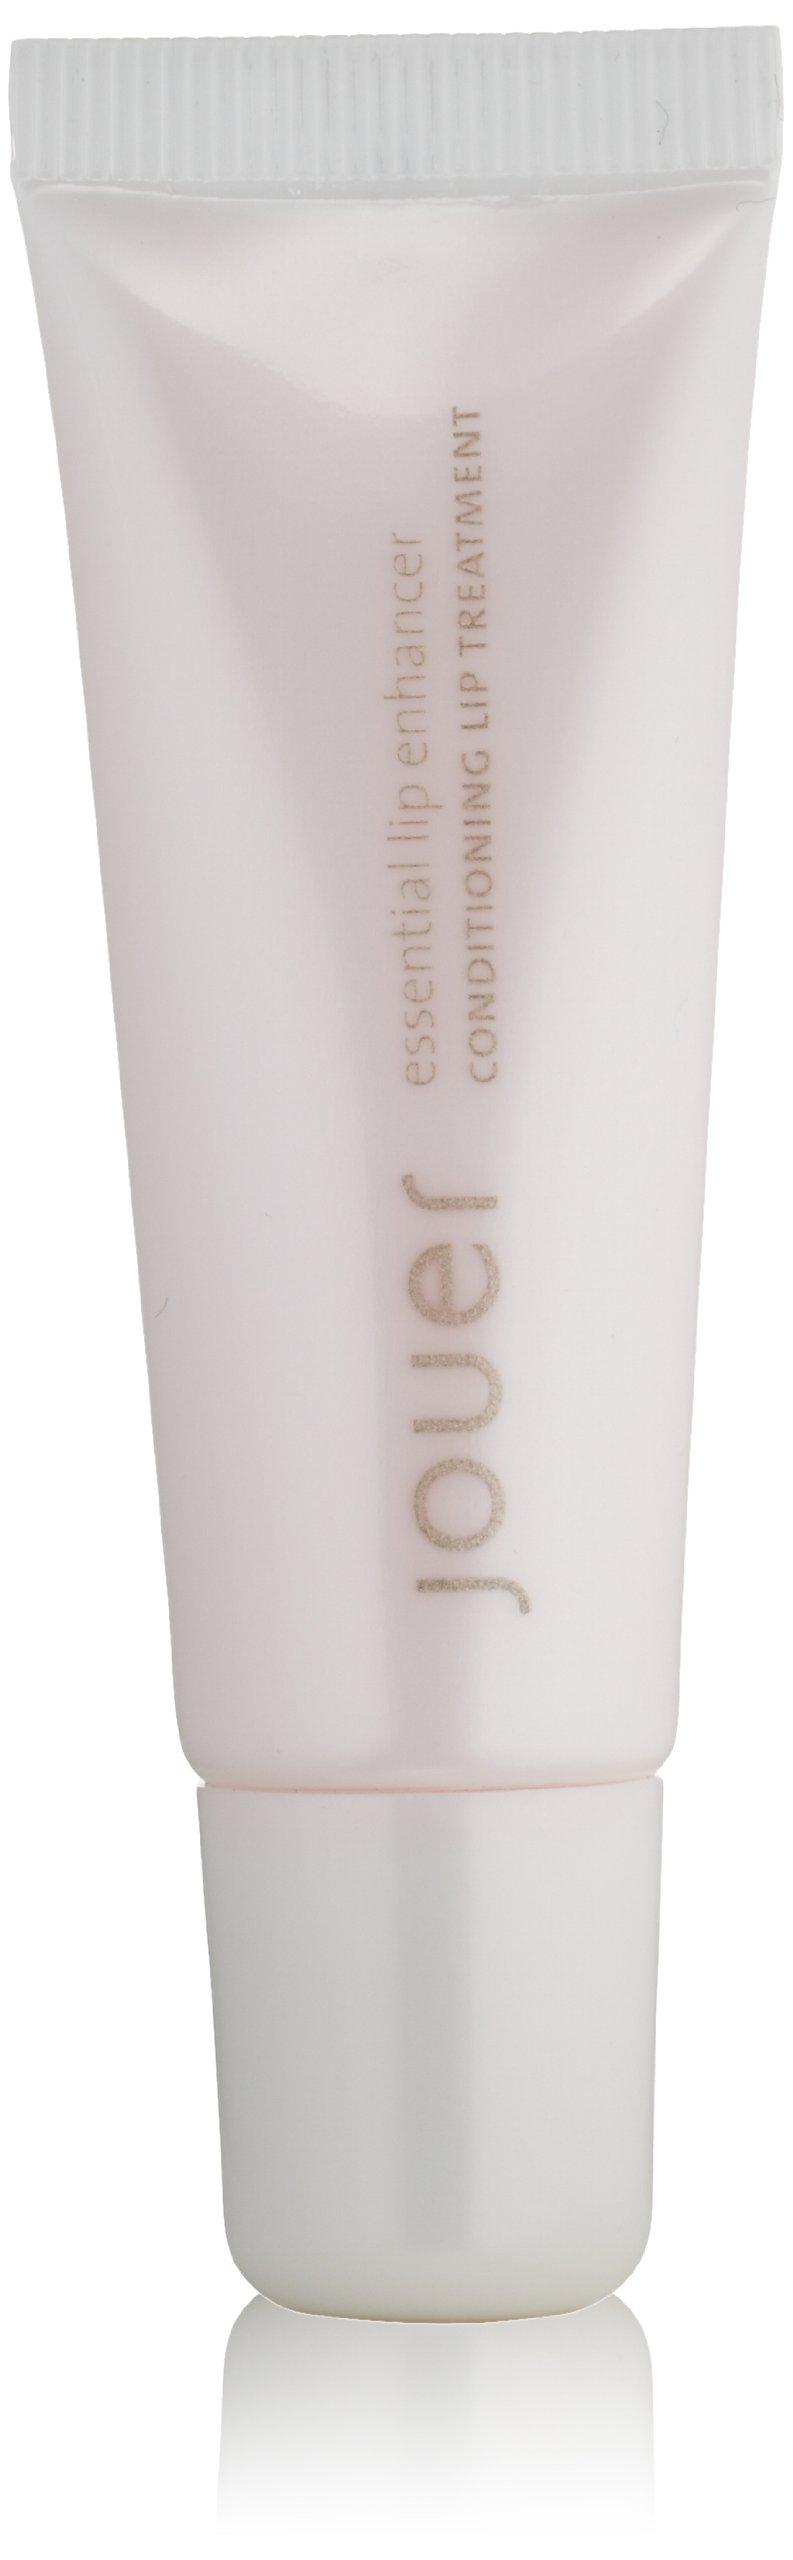 Jouer Essential Lip Enhancer 0.33 Fl Oz by Jouer